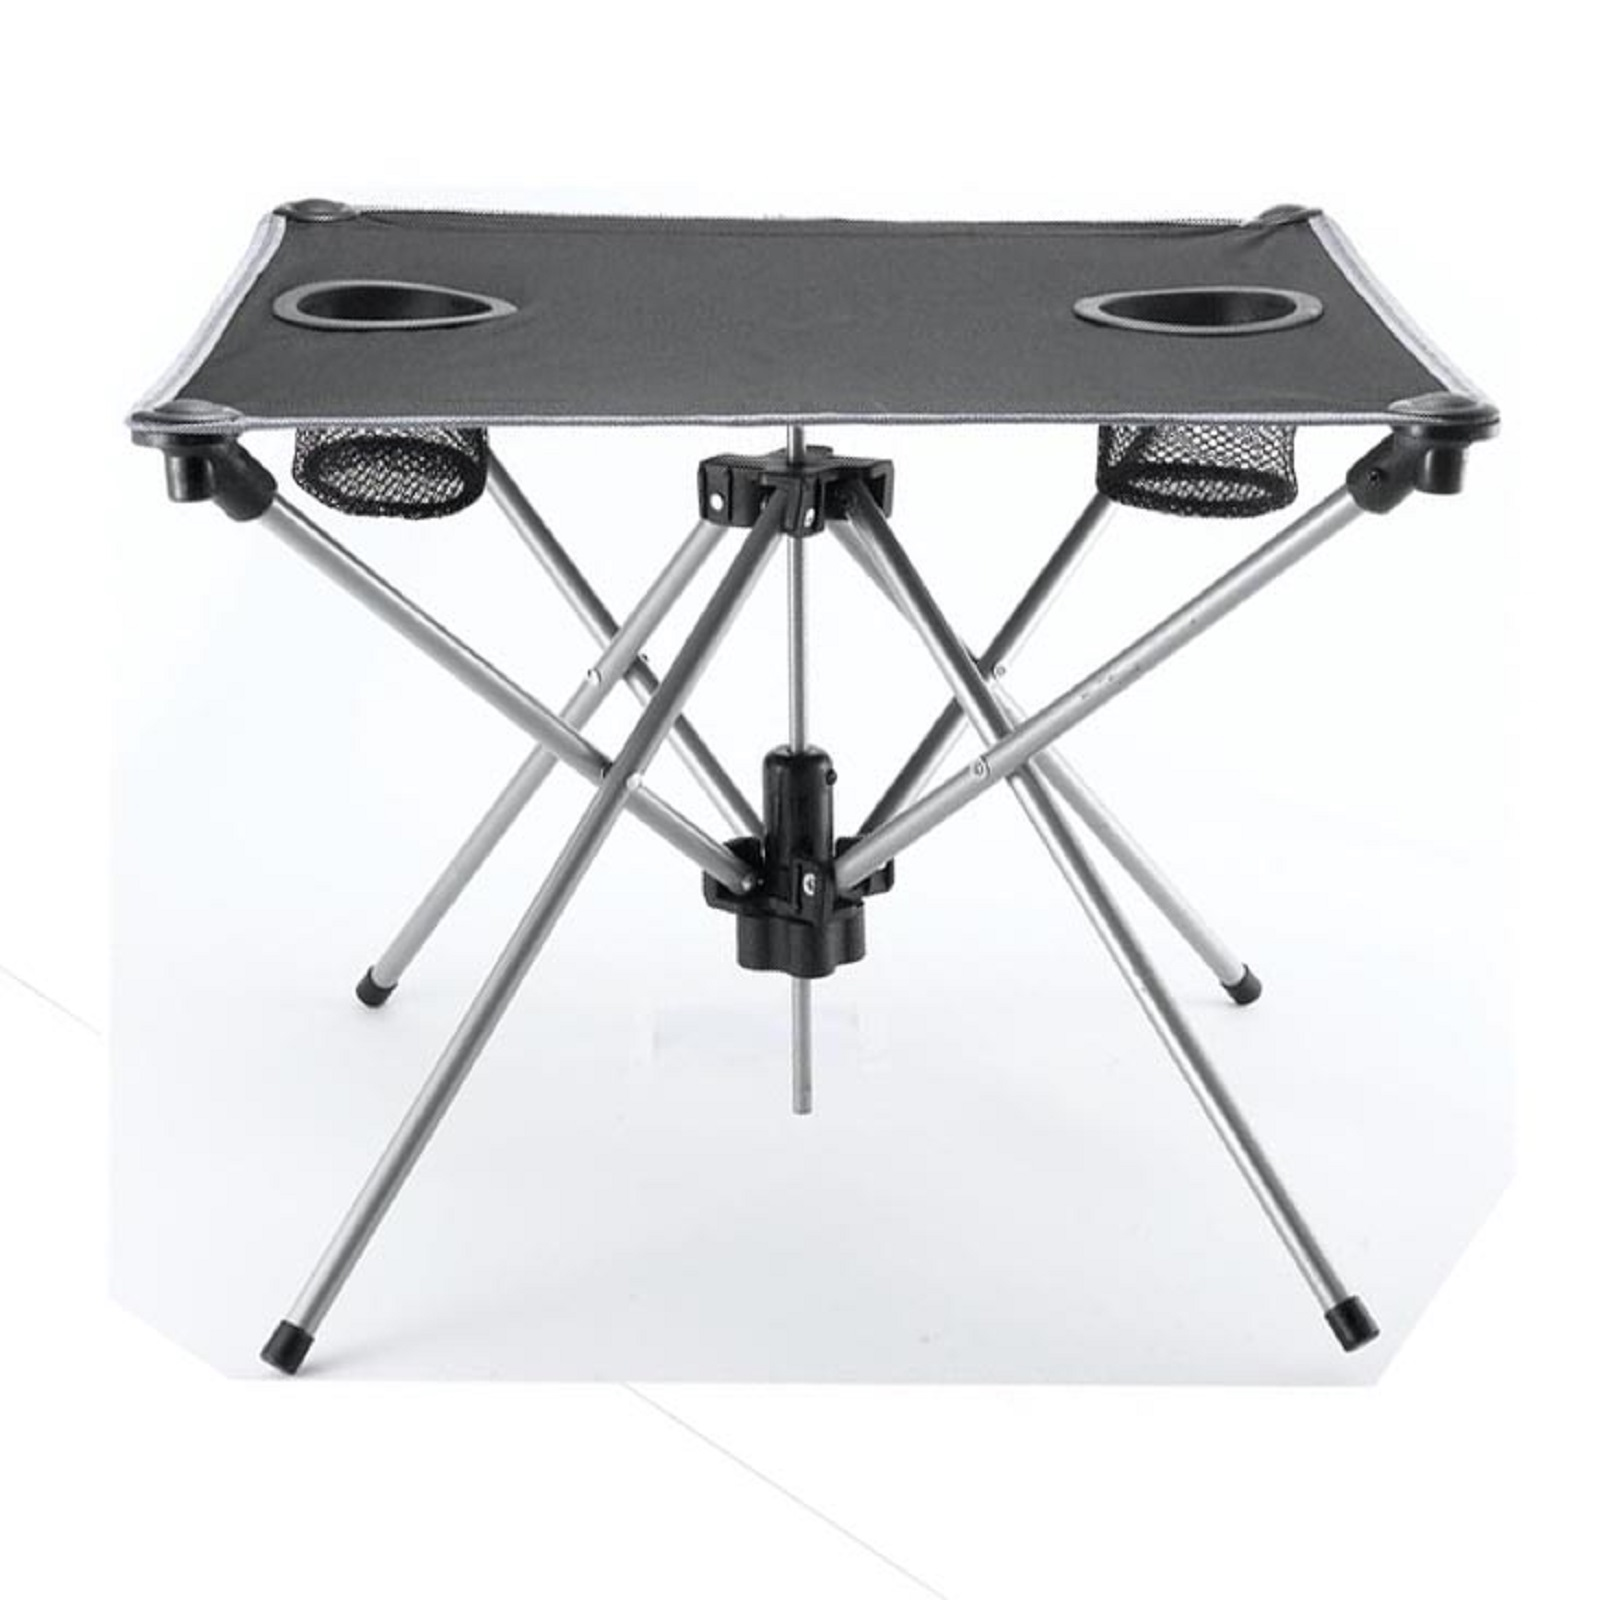 Northwest Territory Portable FoldUp Table  Fitness